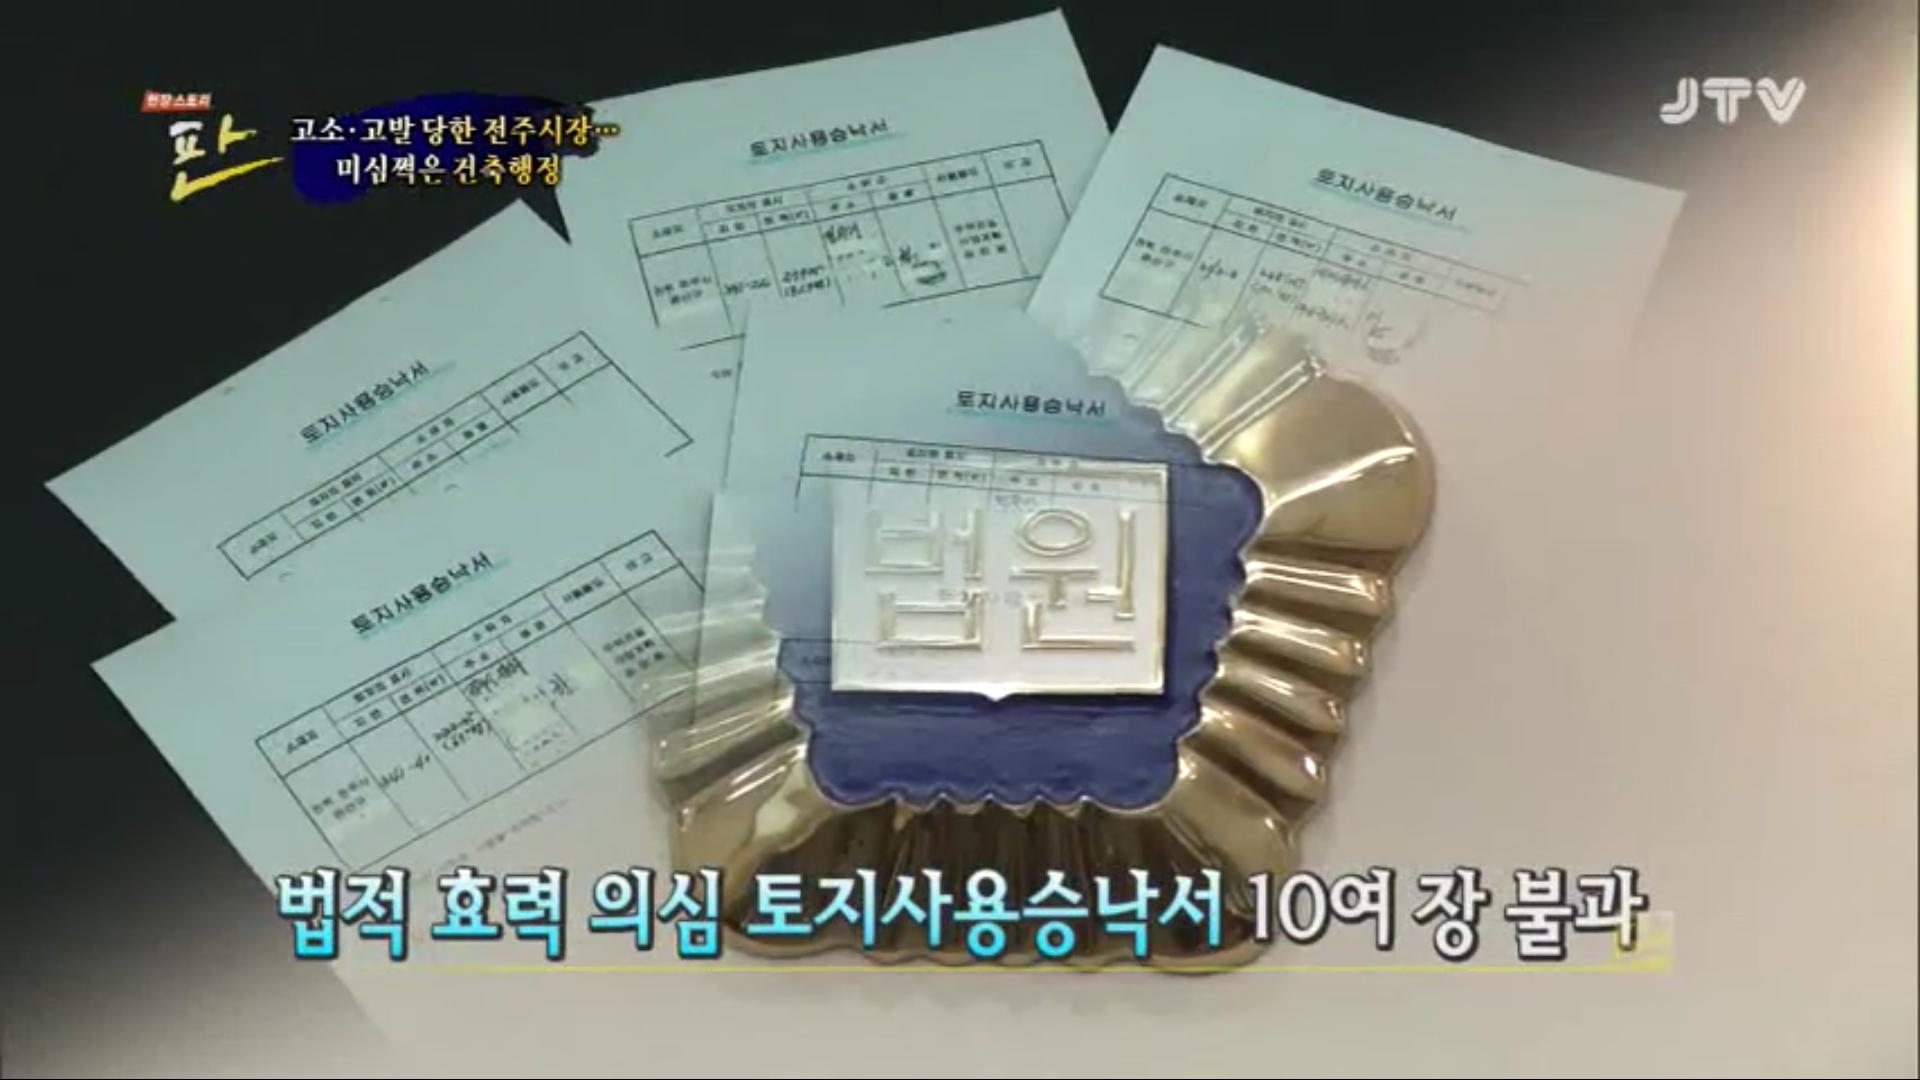 [19.5.3 JTV 현장스토리 판] 고소, 고발 당한 전주시장... 미심쩍은 건축행정3.png